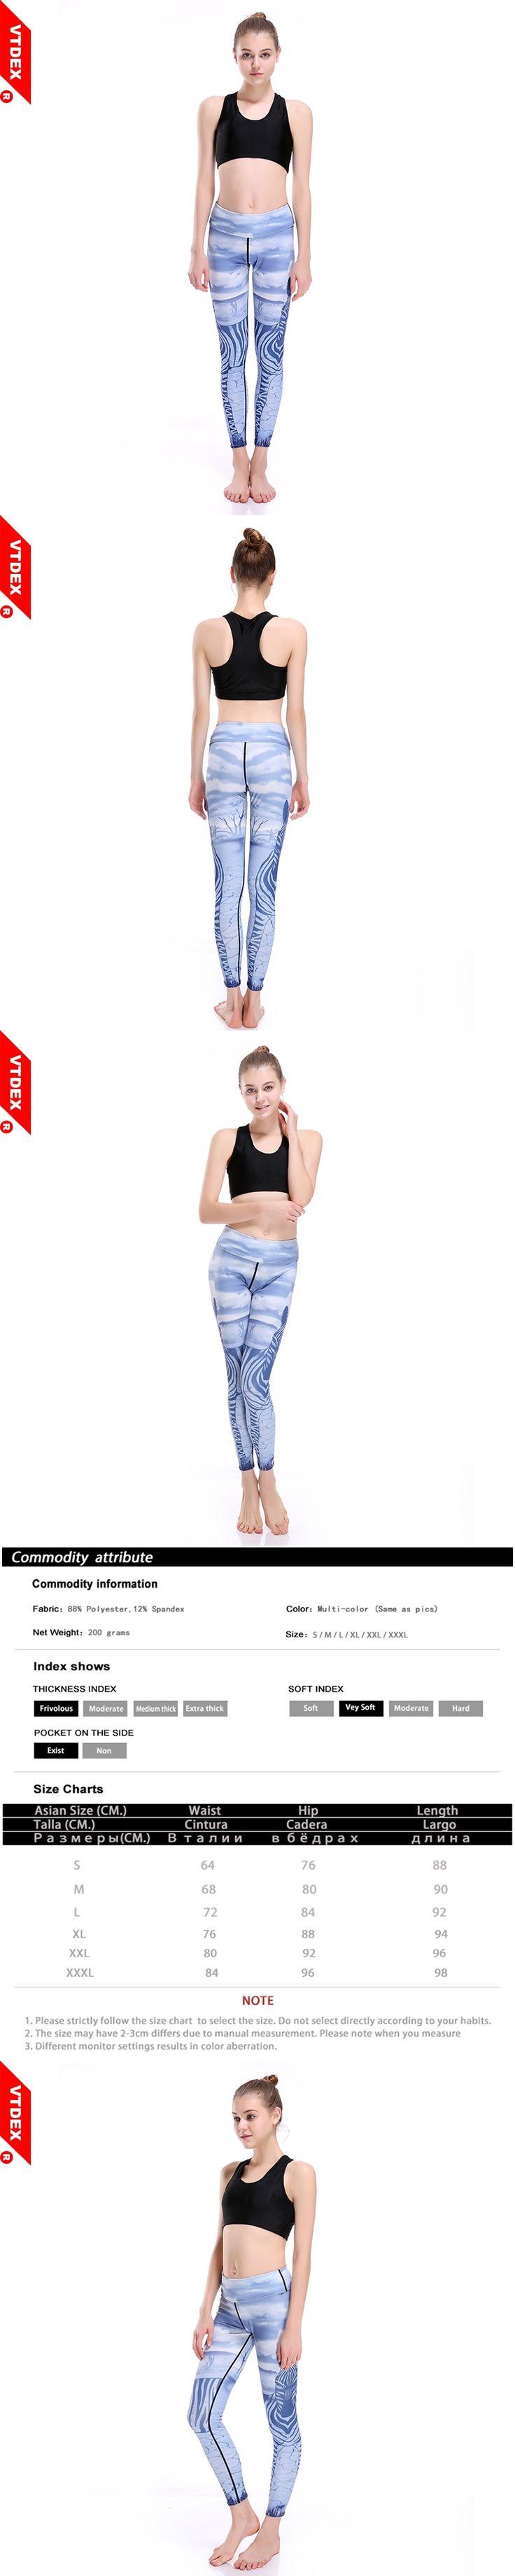 Mallas Mujer Deportivas Jis Women Yoga Pants Zebra Printed Fitness Super Elastic Spandex Sports Leggings Running Workout Gym